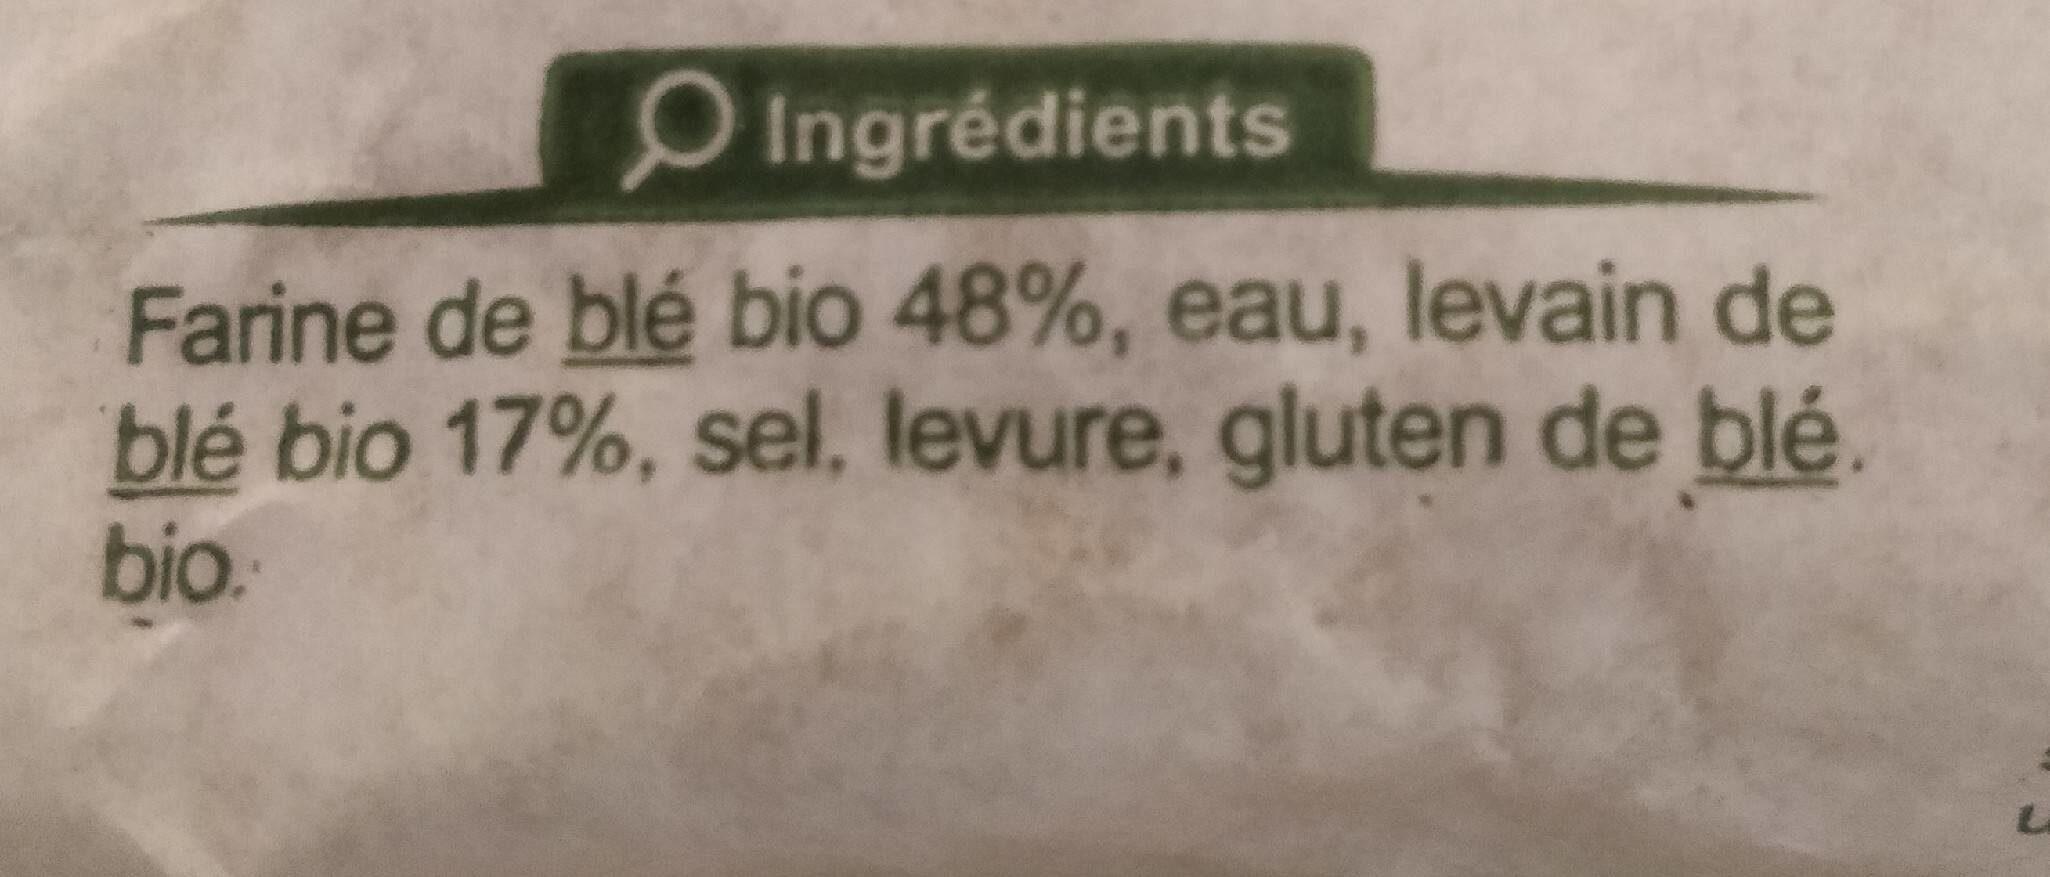 La boule bio - Valori nutrizionali - fr